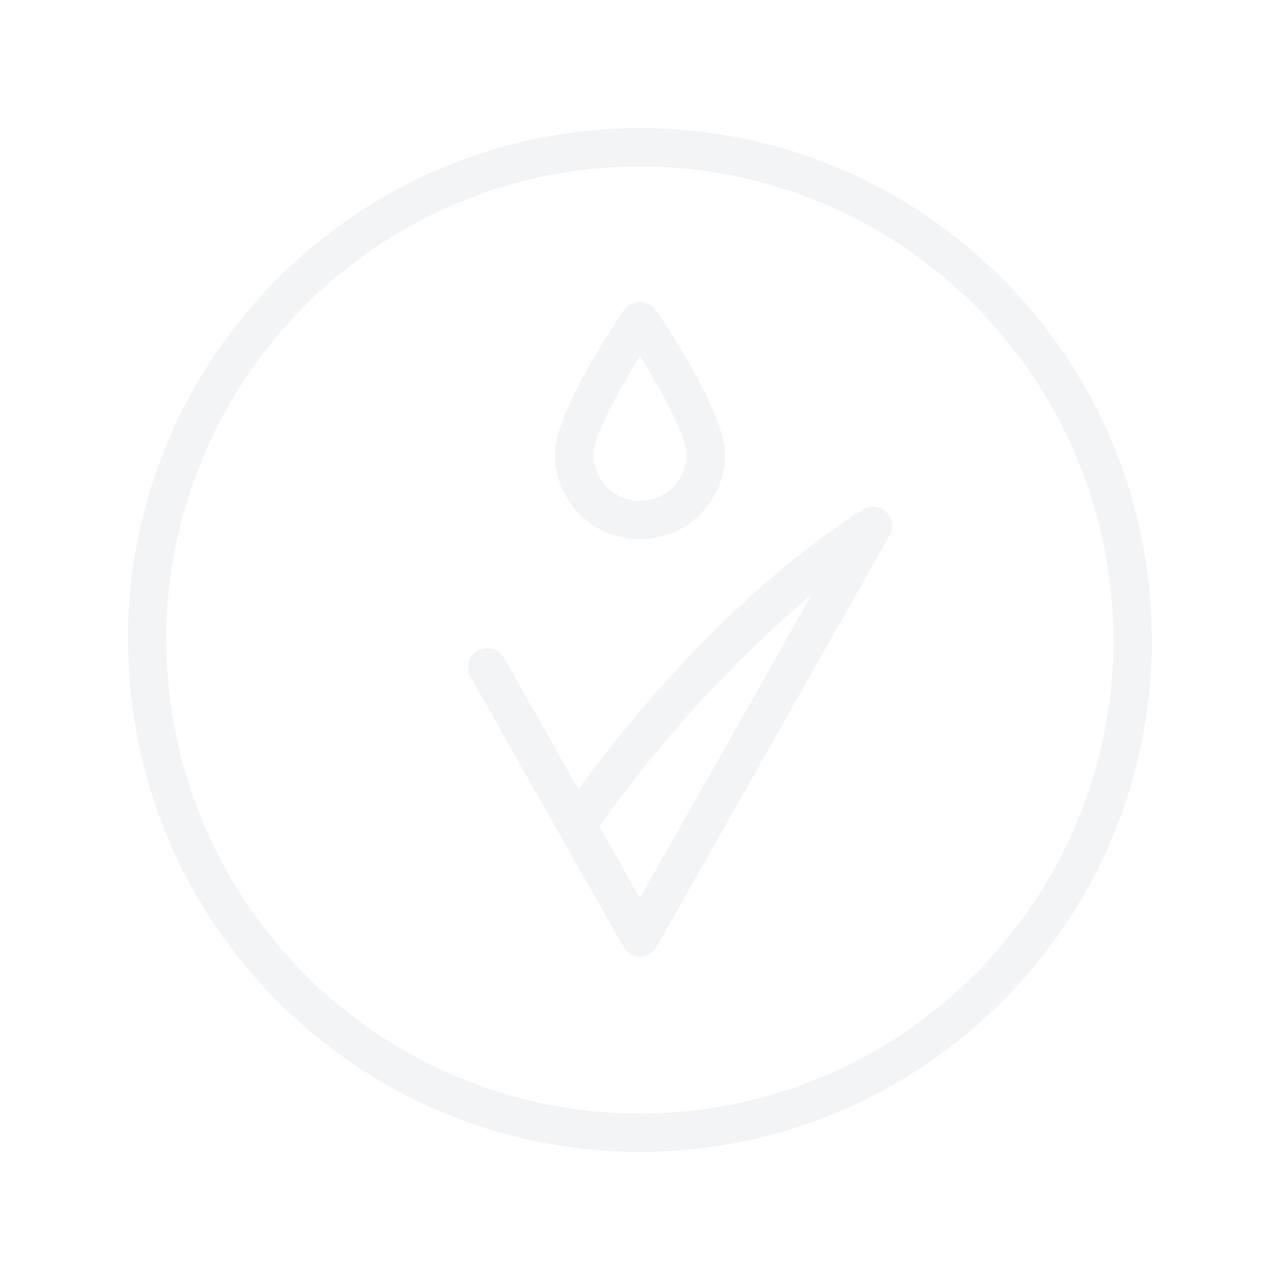 SUPERMOOD Beauty Sleep Youth Restoring Night Cream 30ml